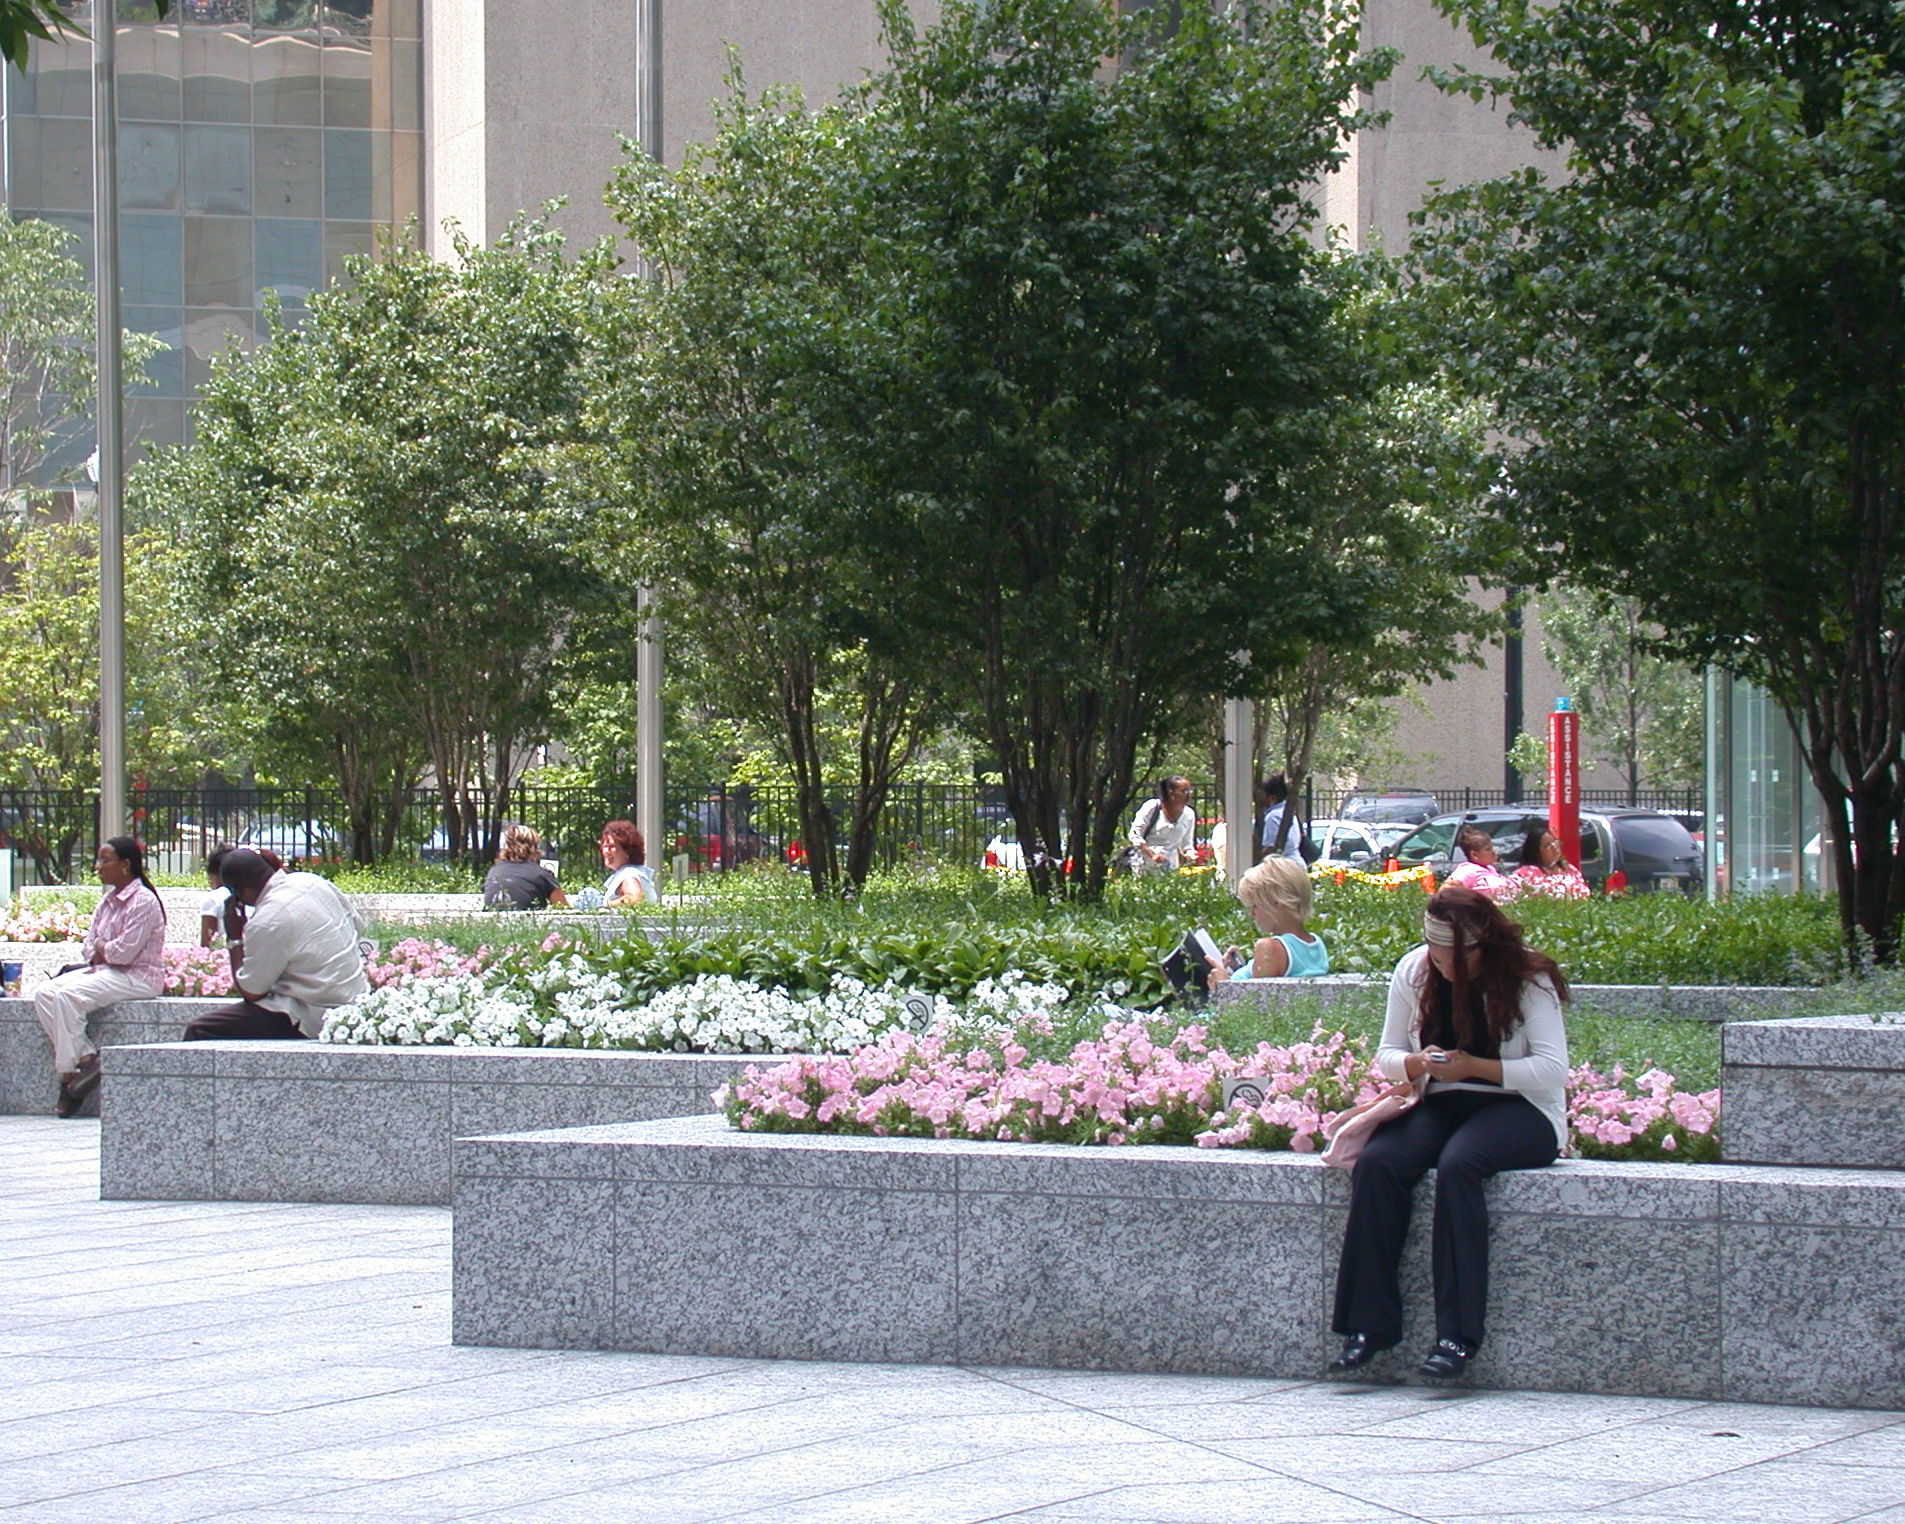 ABN AMRO Plaza